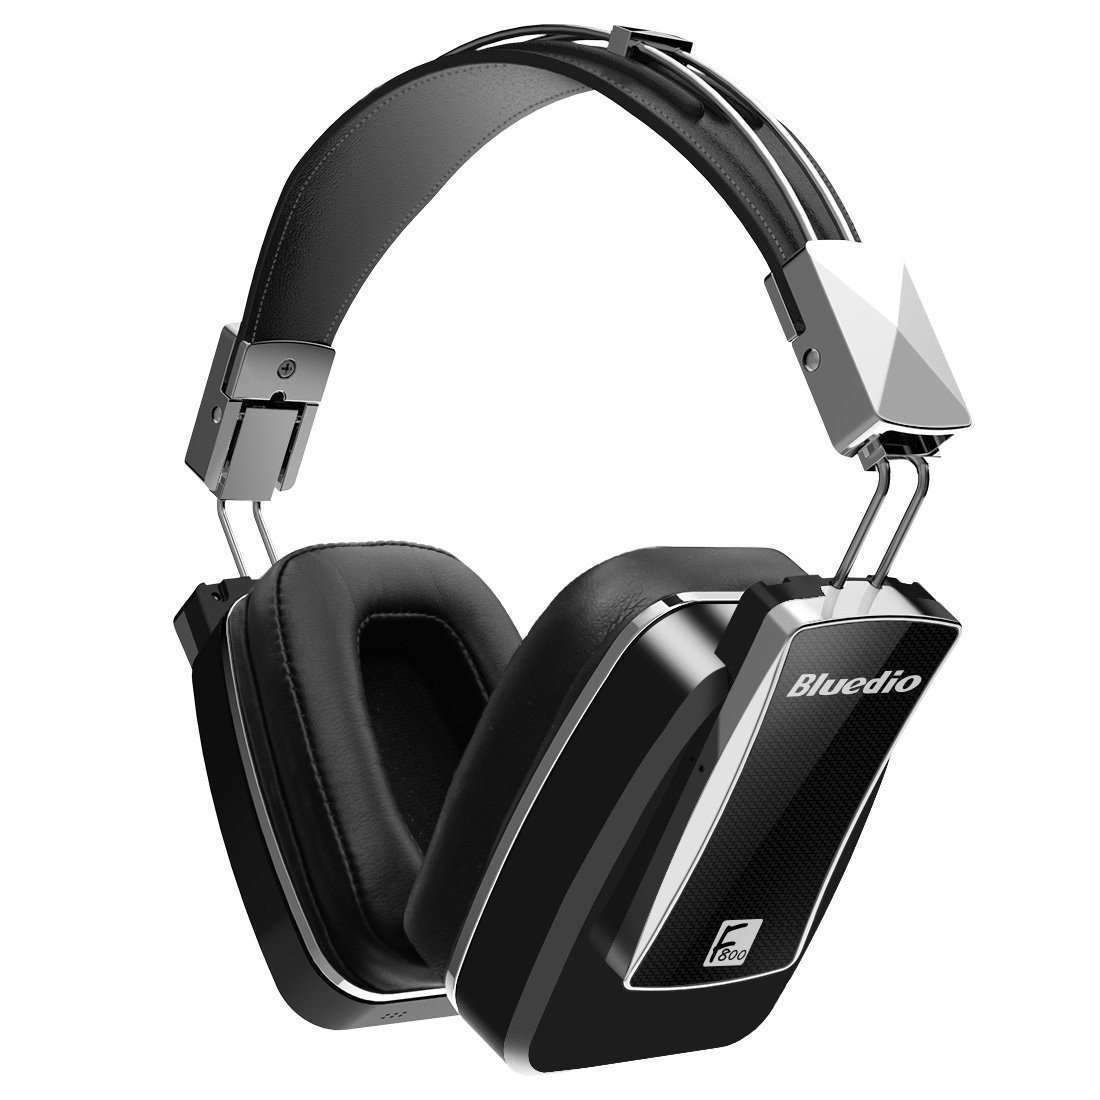 Bluedio F800 Bluetooth Headphones active noisecanceling